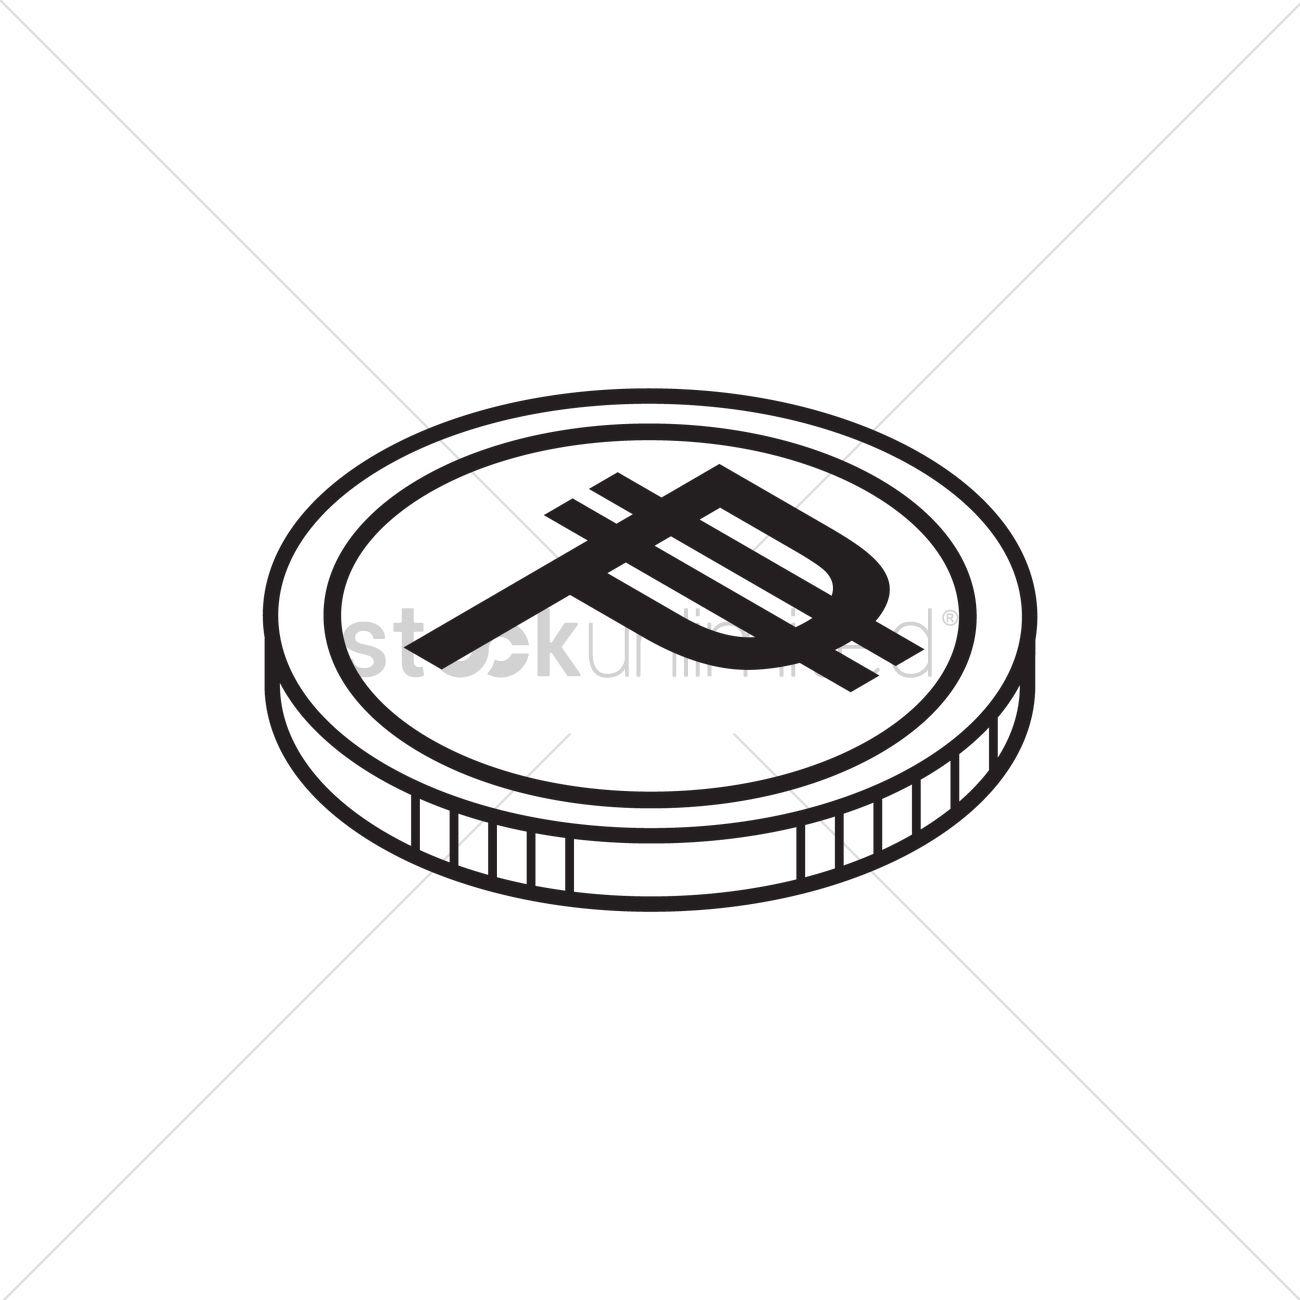 Mexican Pesos Symbol Vector Image 2014728 Stockunlimited